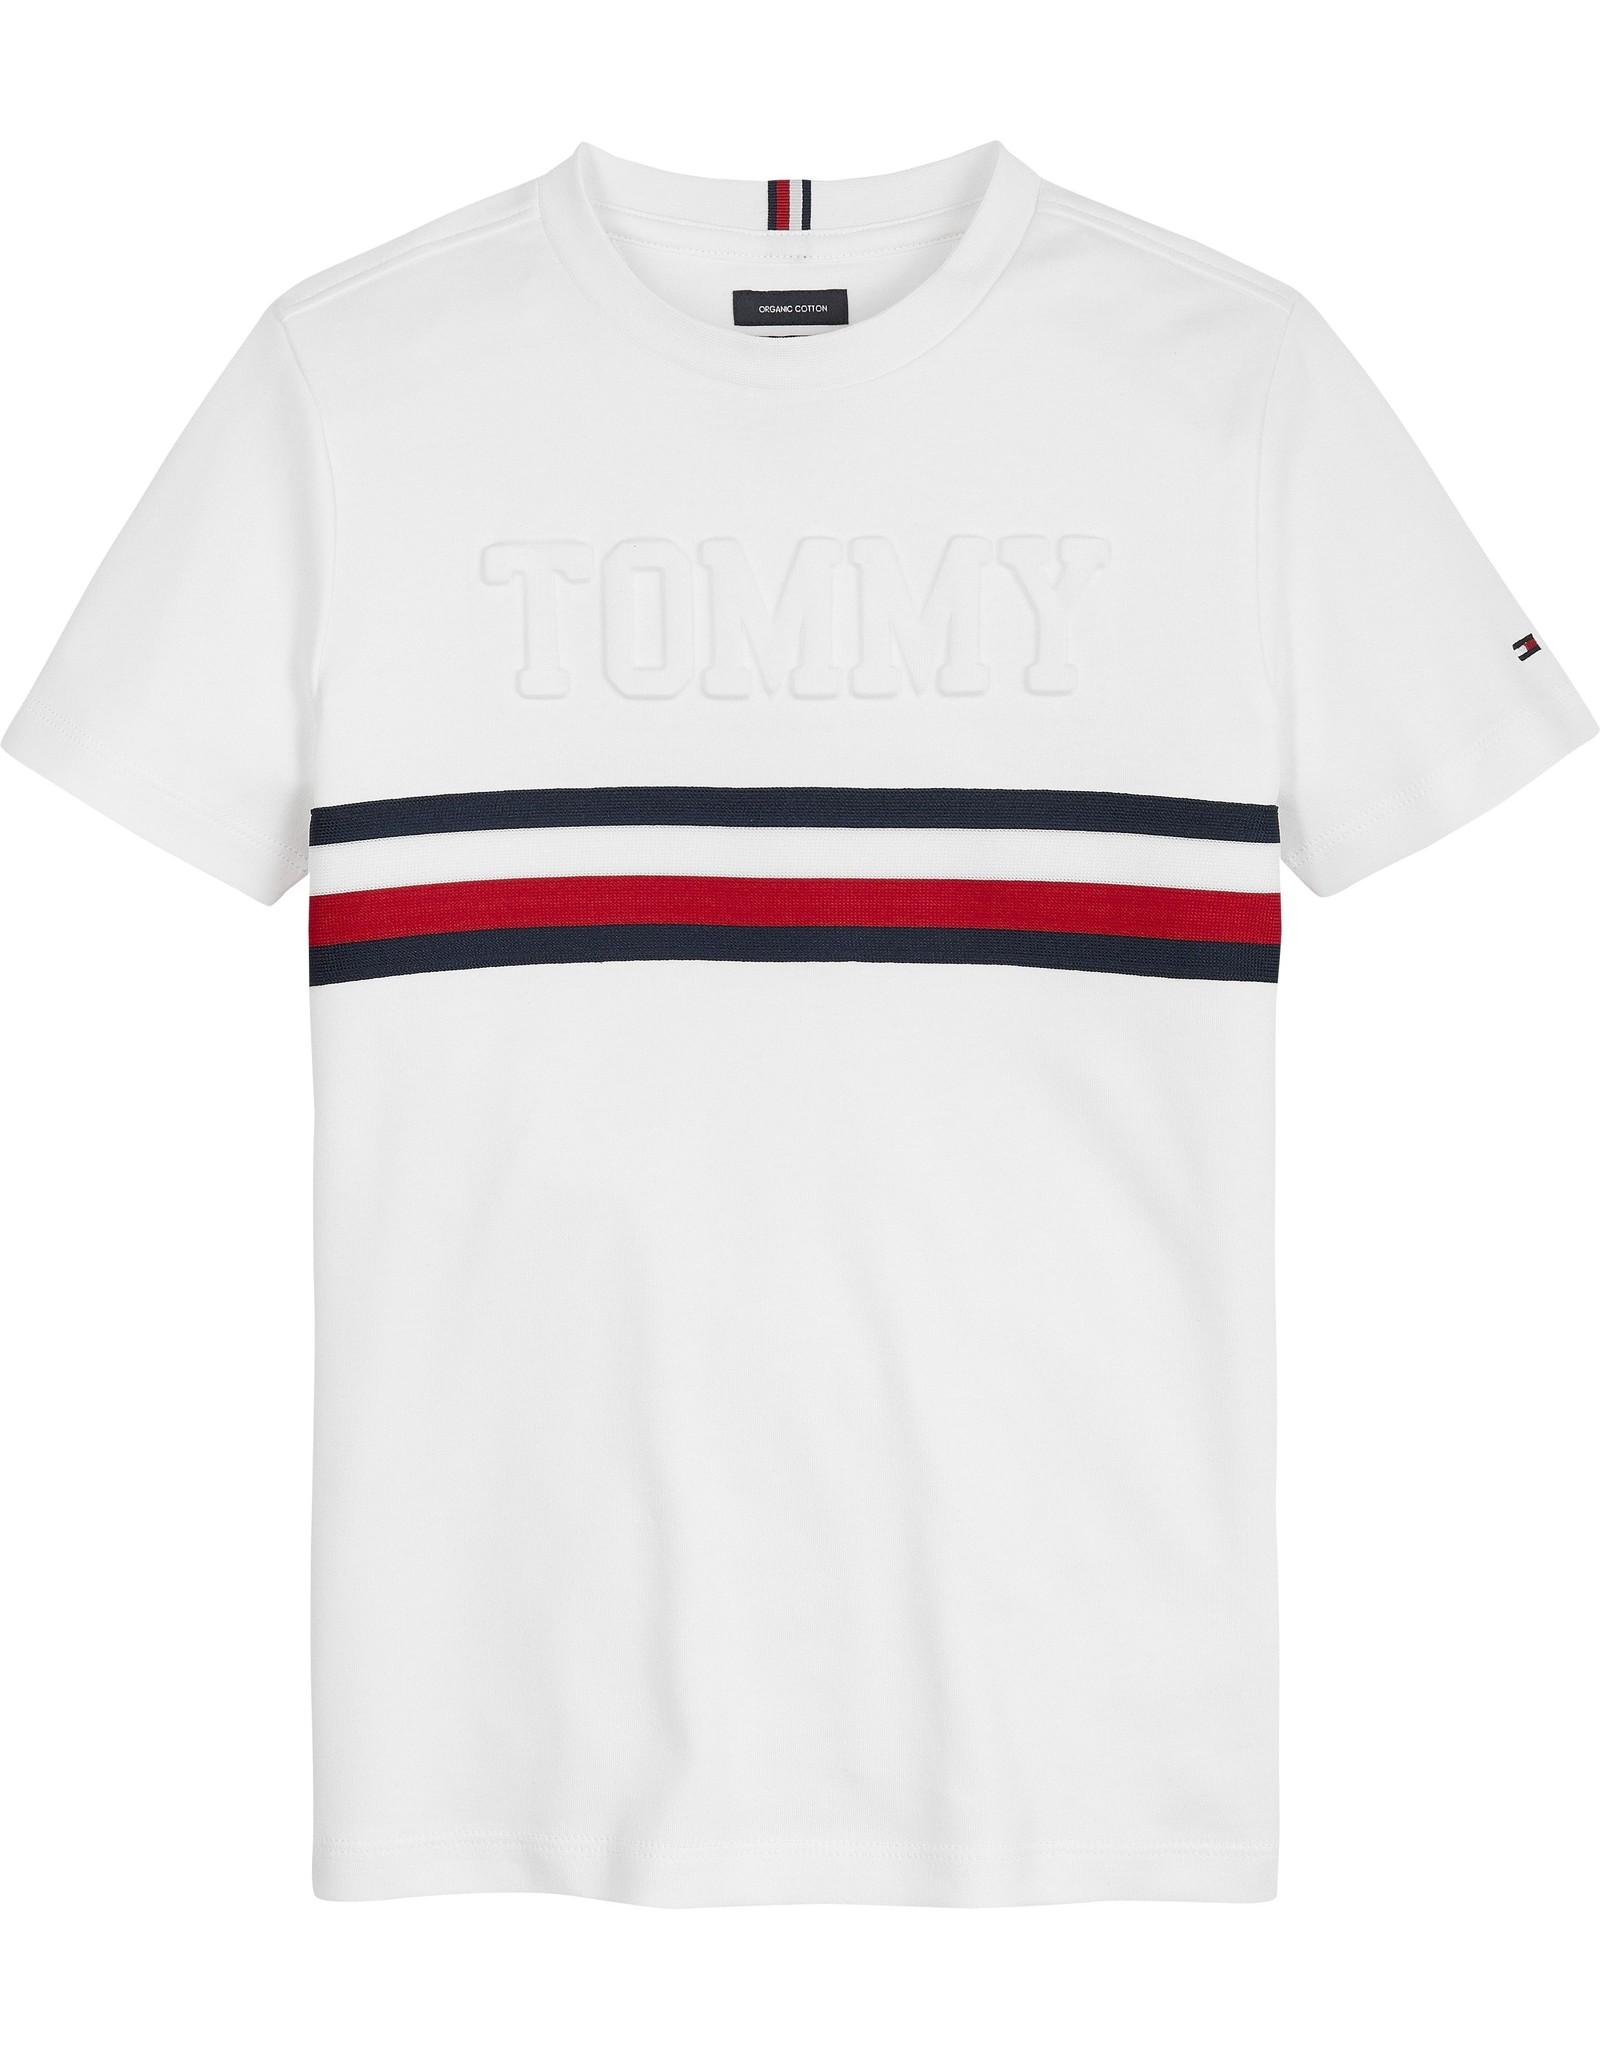 Tommy Hilfiger 6320 T-Shirt